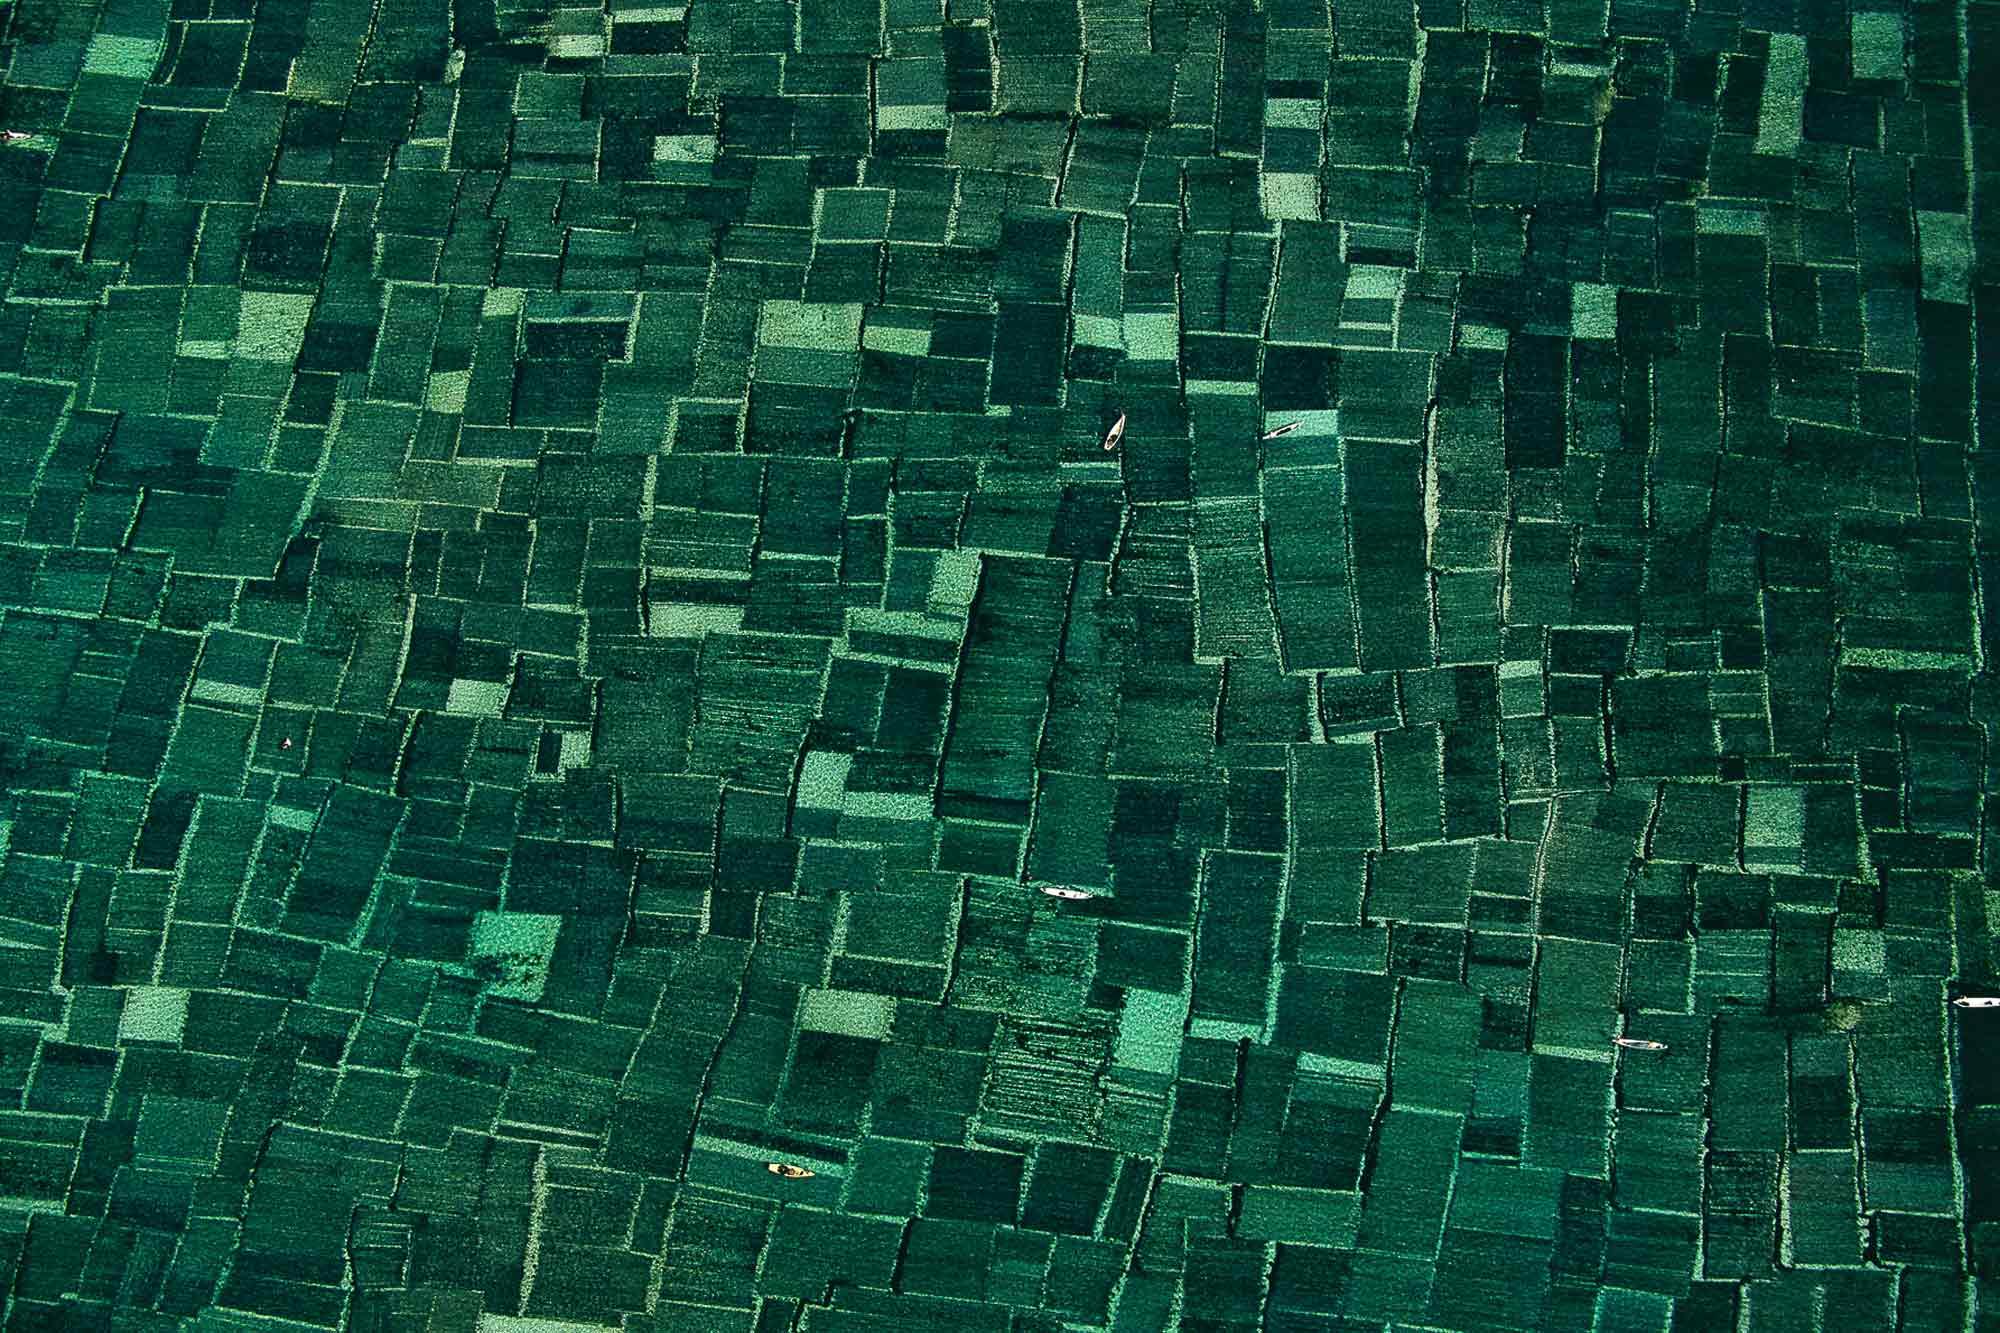 Algaculture - Yann Arthus-Bertrand